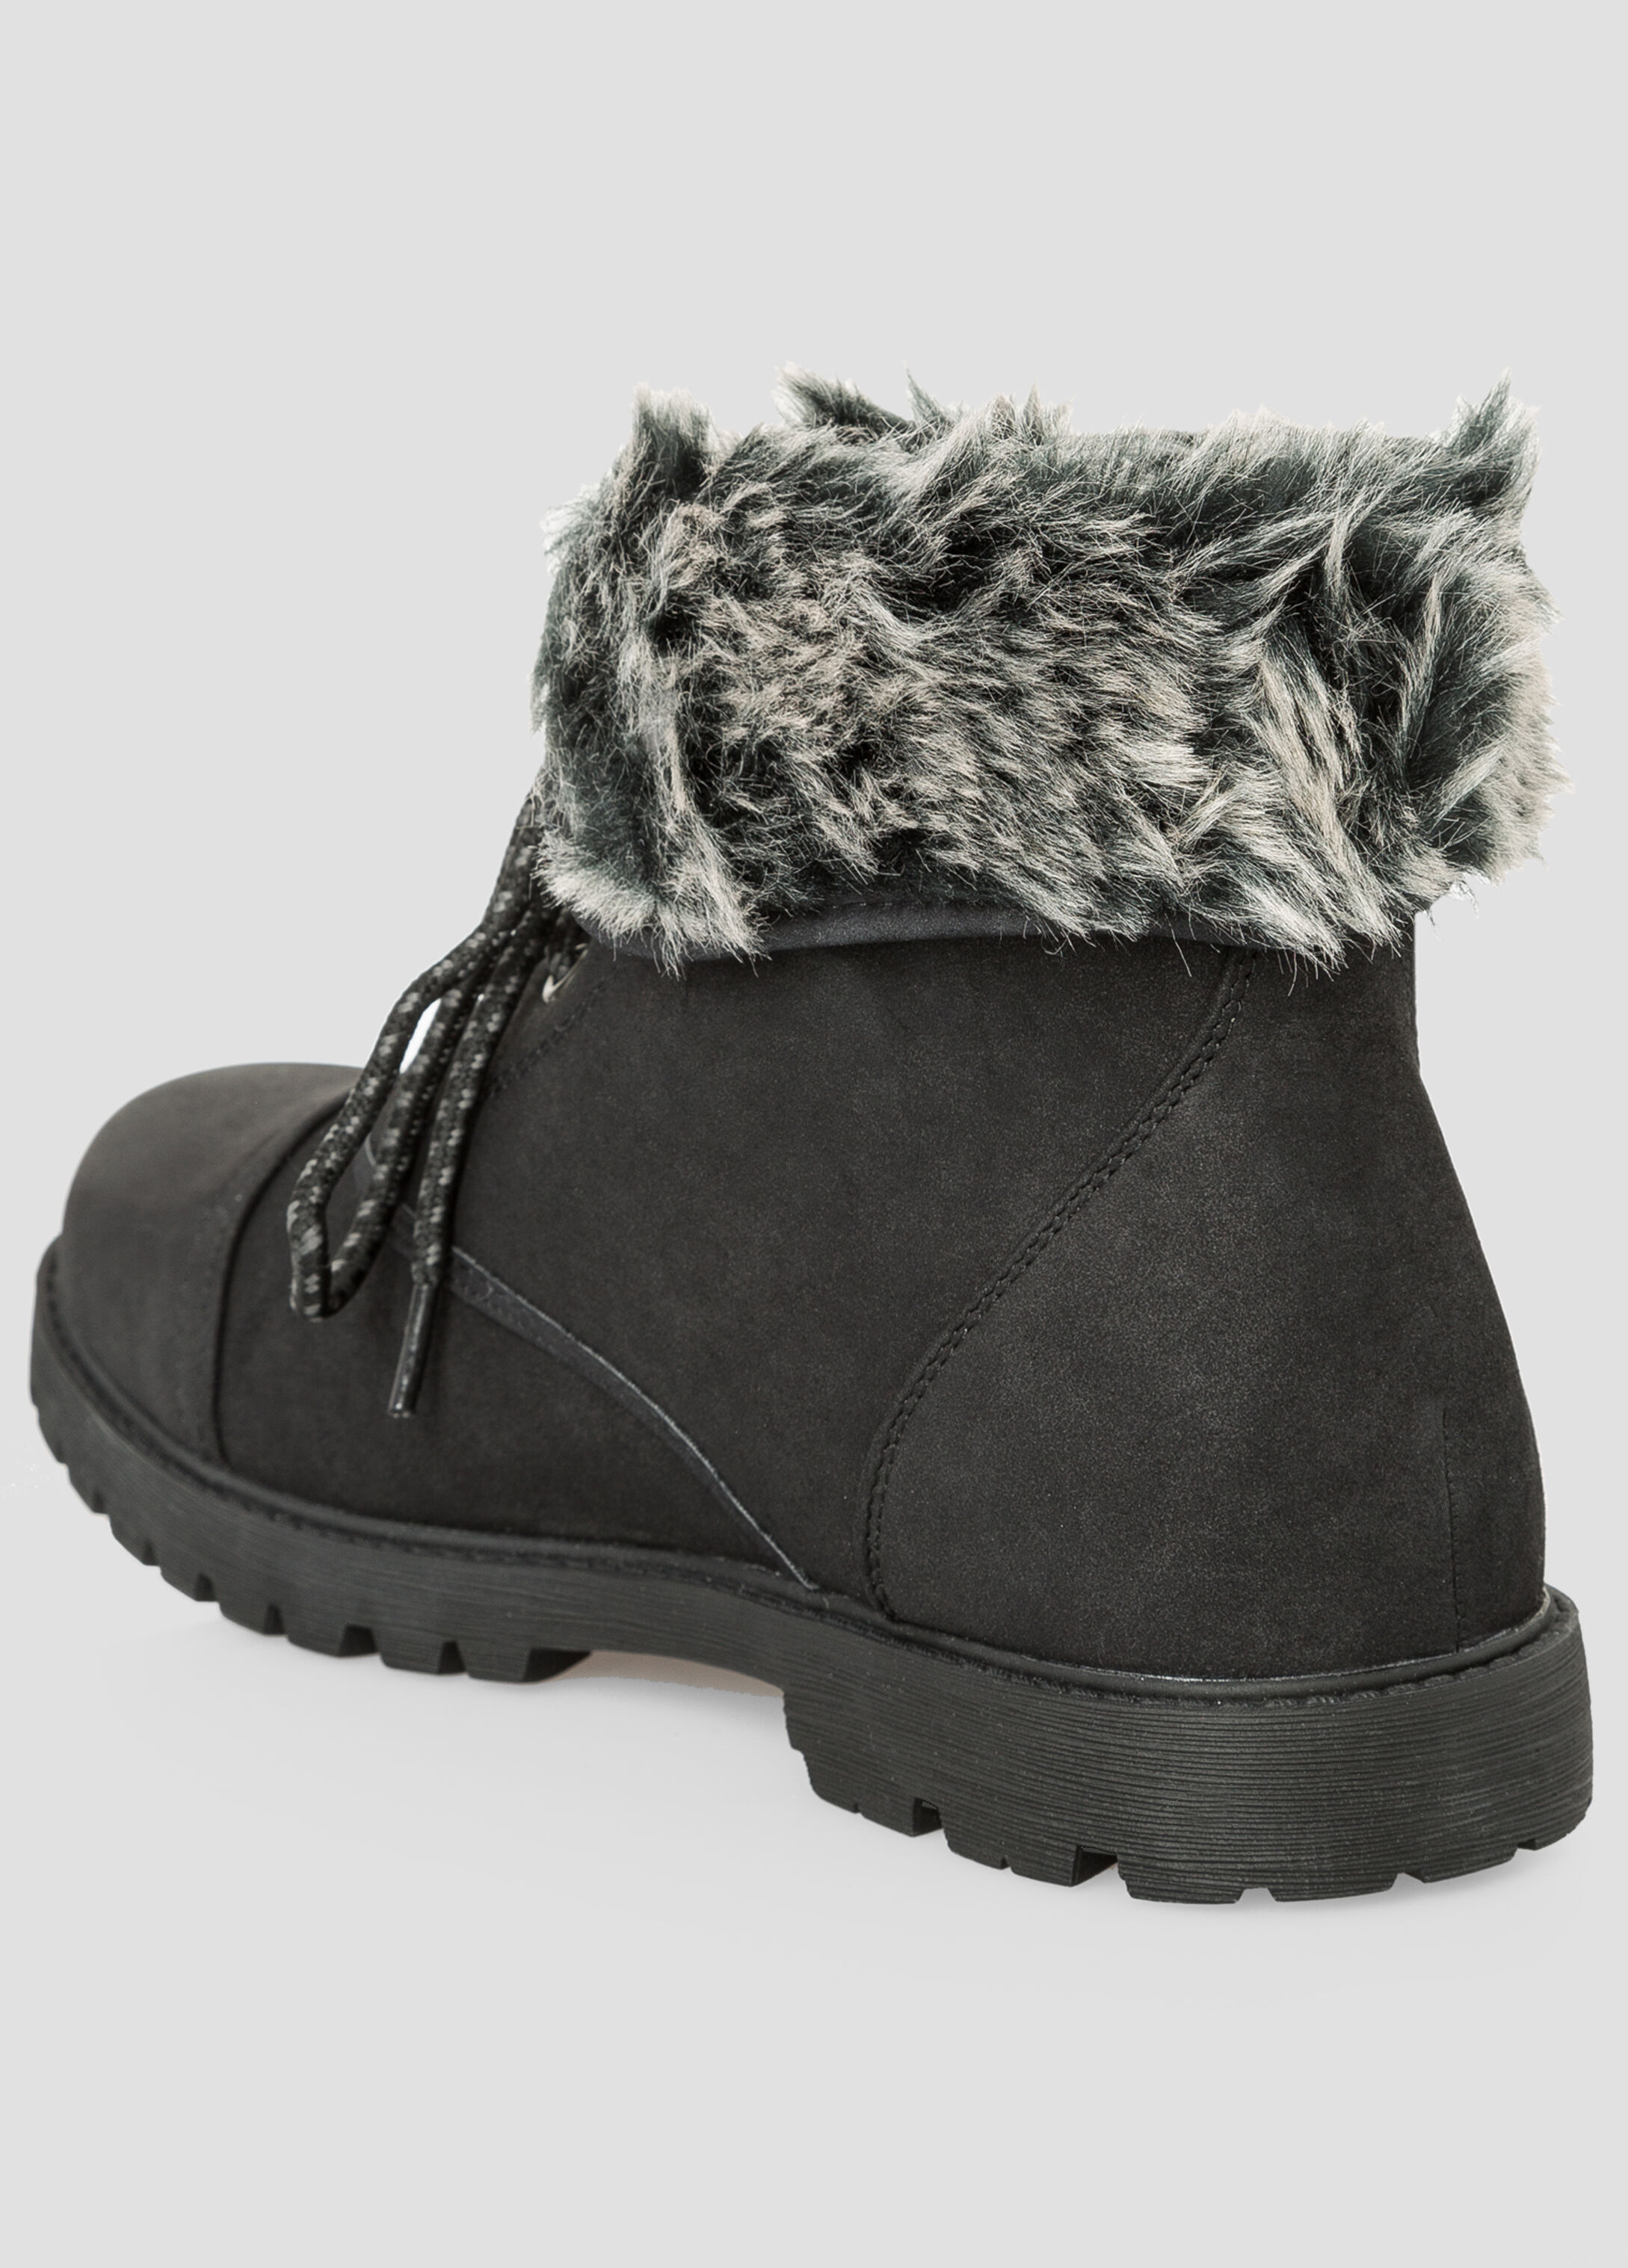 Fur Lined Boot - Wide Width